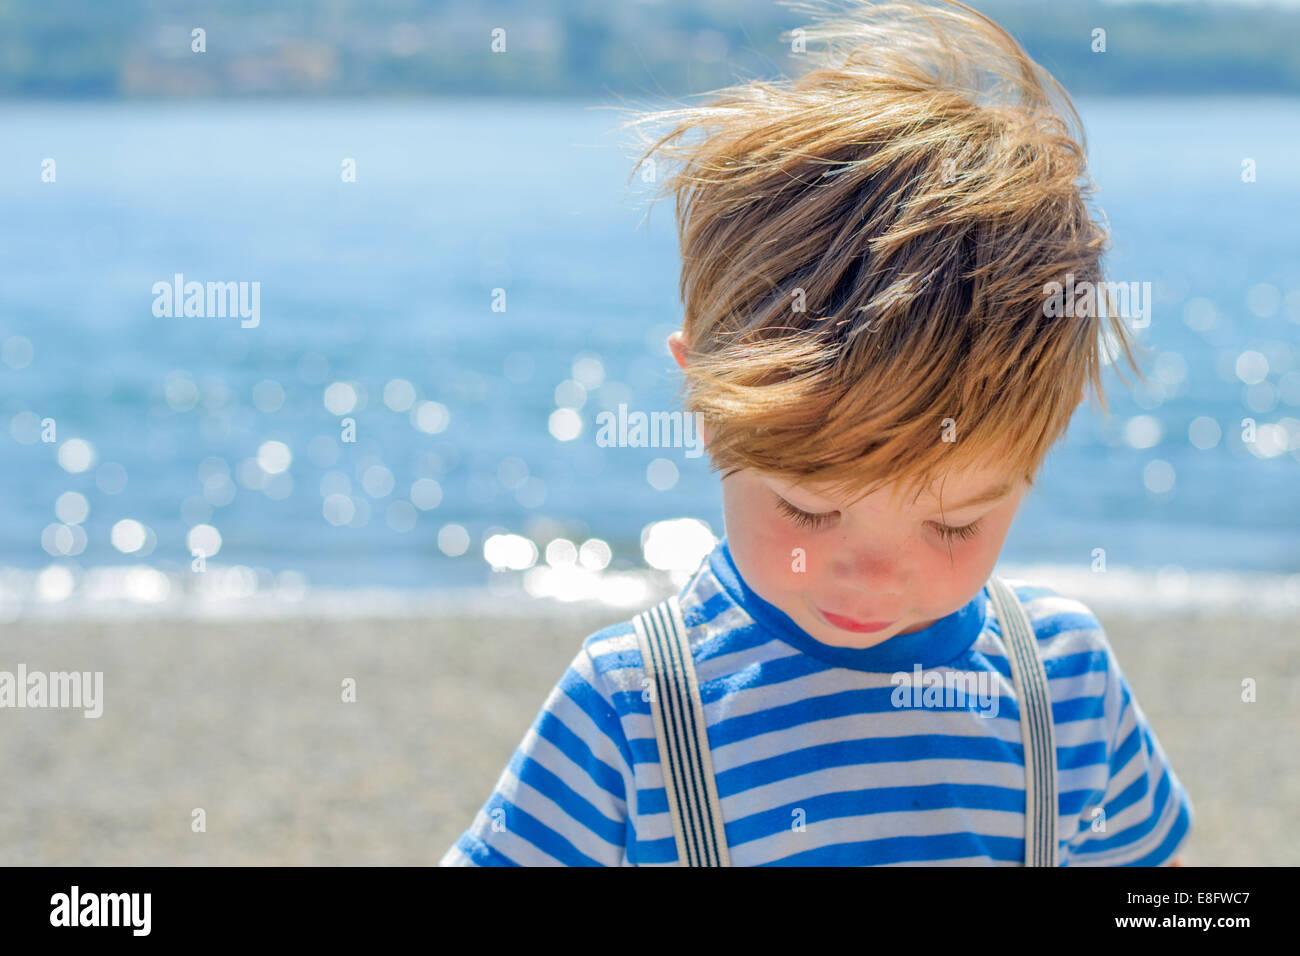 Junge am Strand (2-3 Jahre) Stockbild